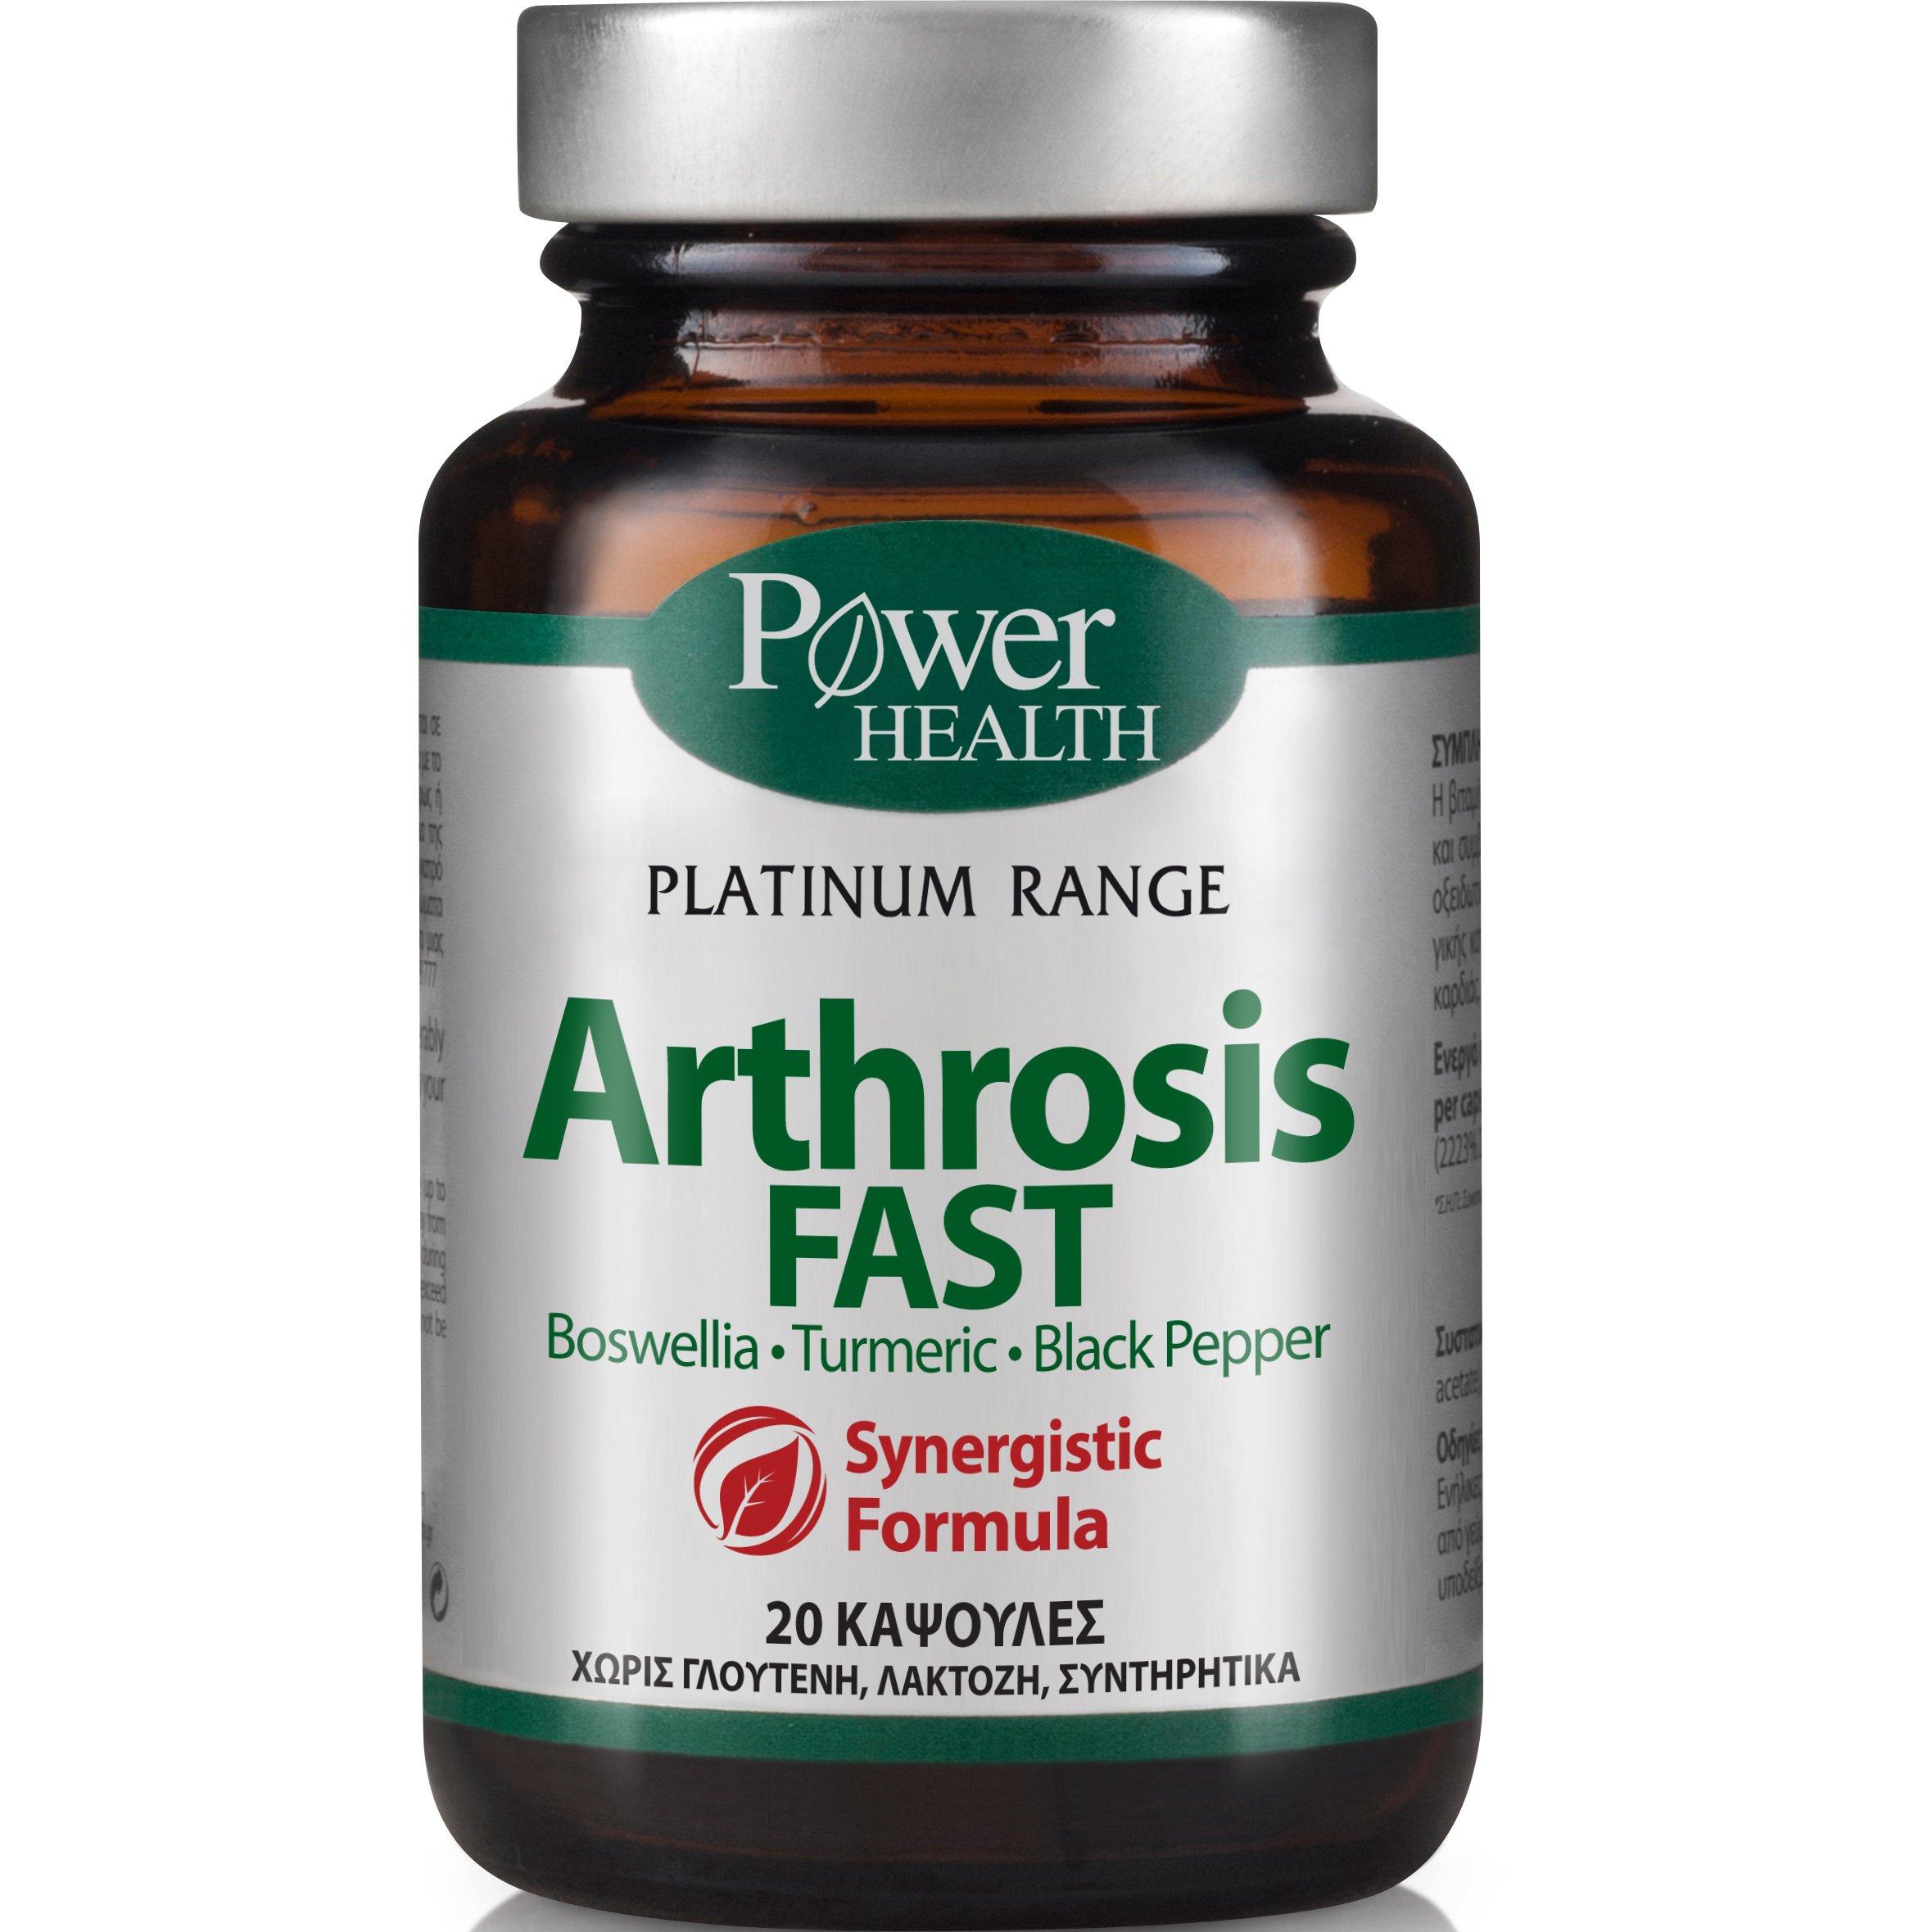 Power Health Platinum Arthrosis Fast Φυσικό Παυσίπονο Άμεσης Ανακούφισης στις Έντονες Ενοχλήσεις των Αρθρώσεων 20caps